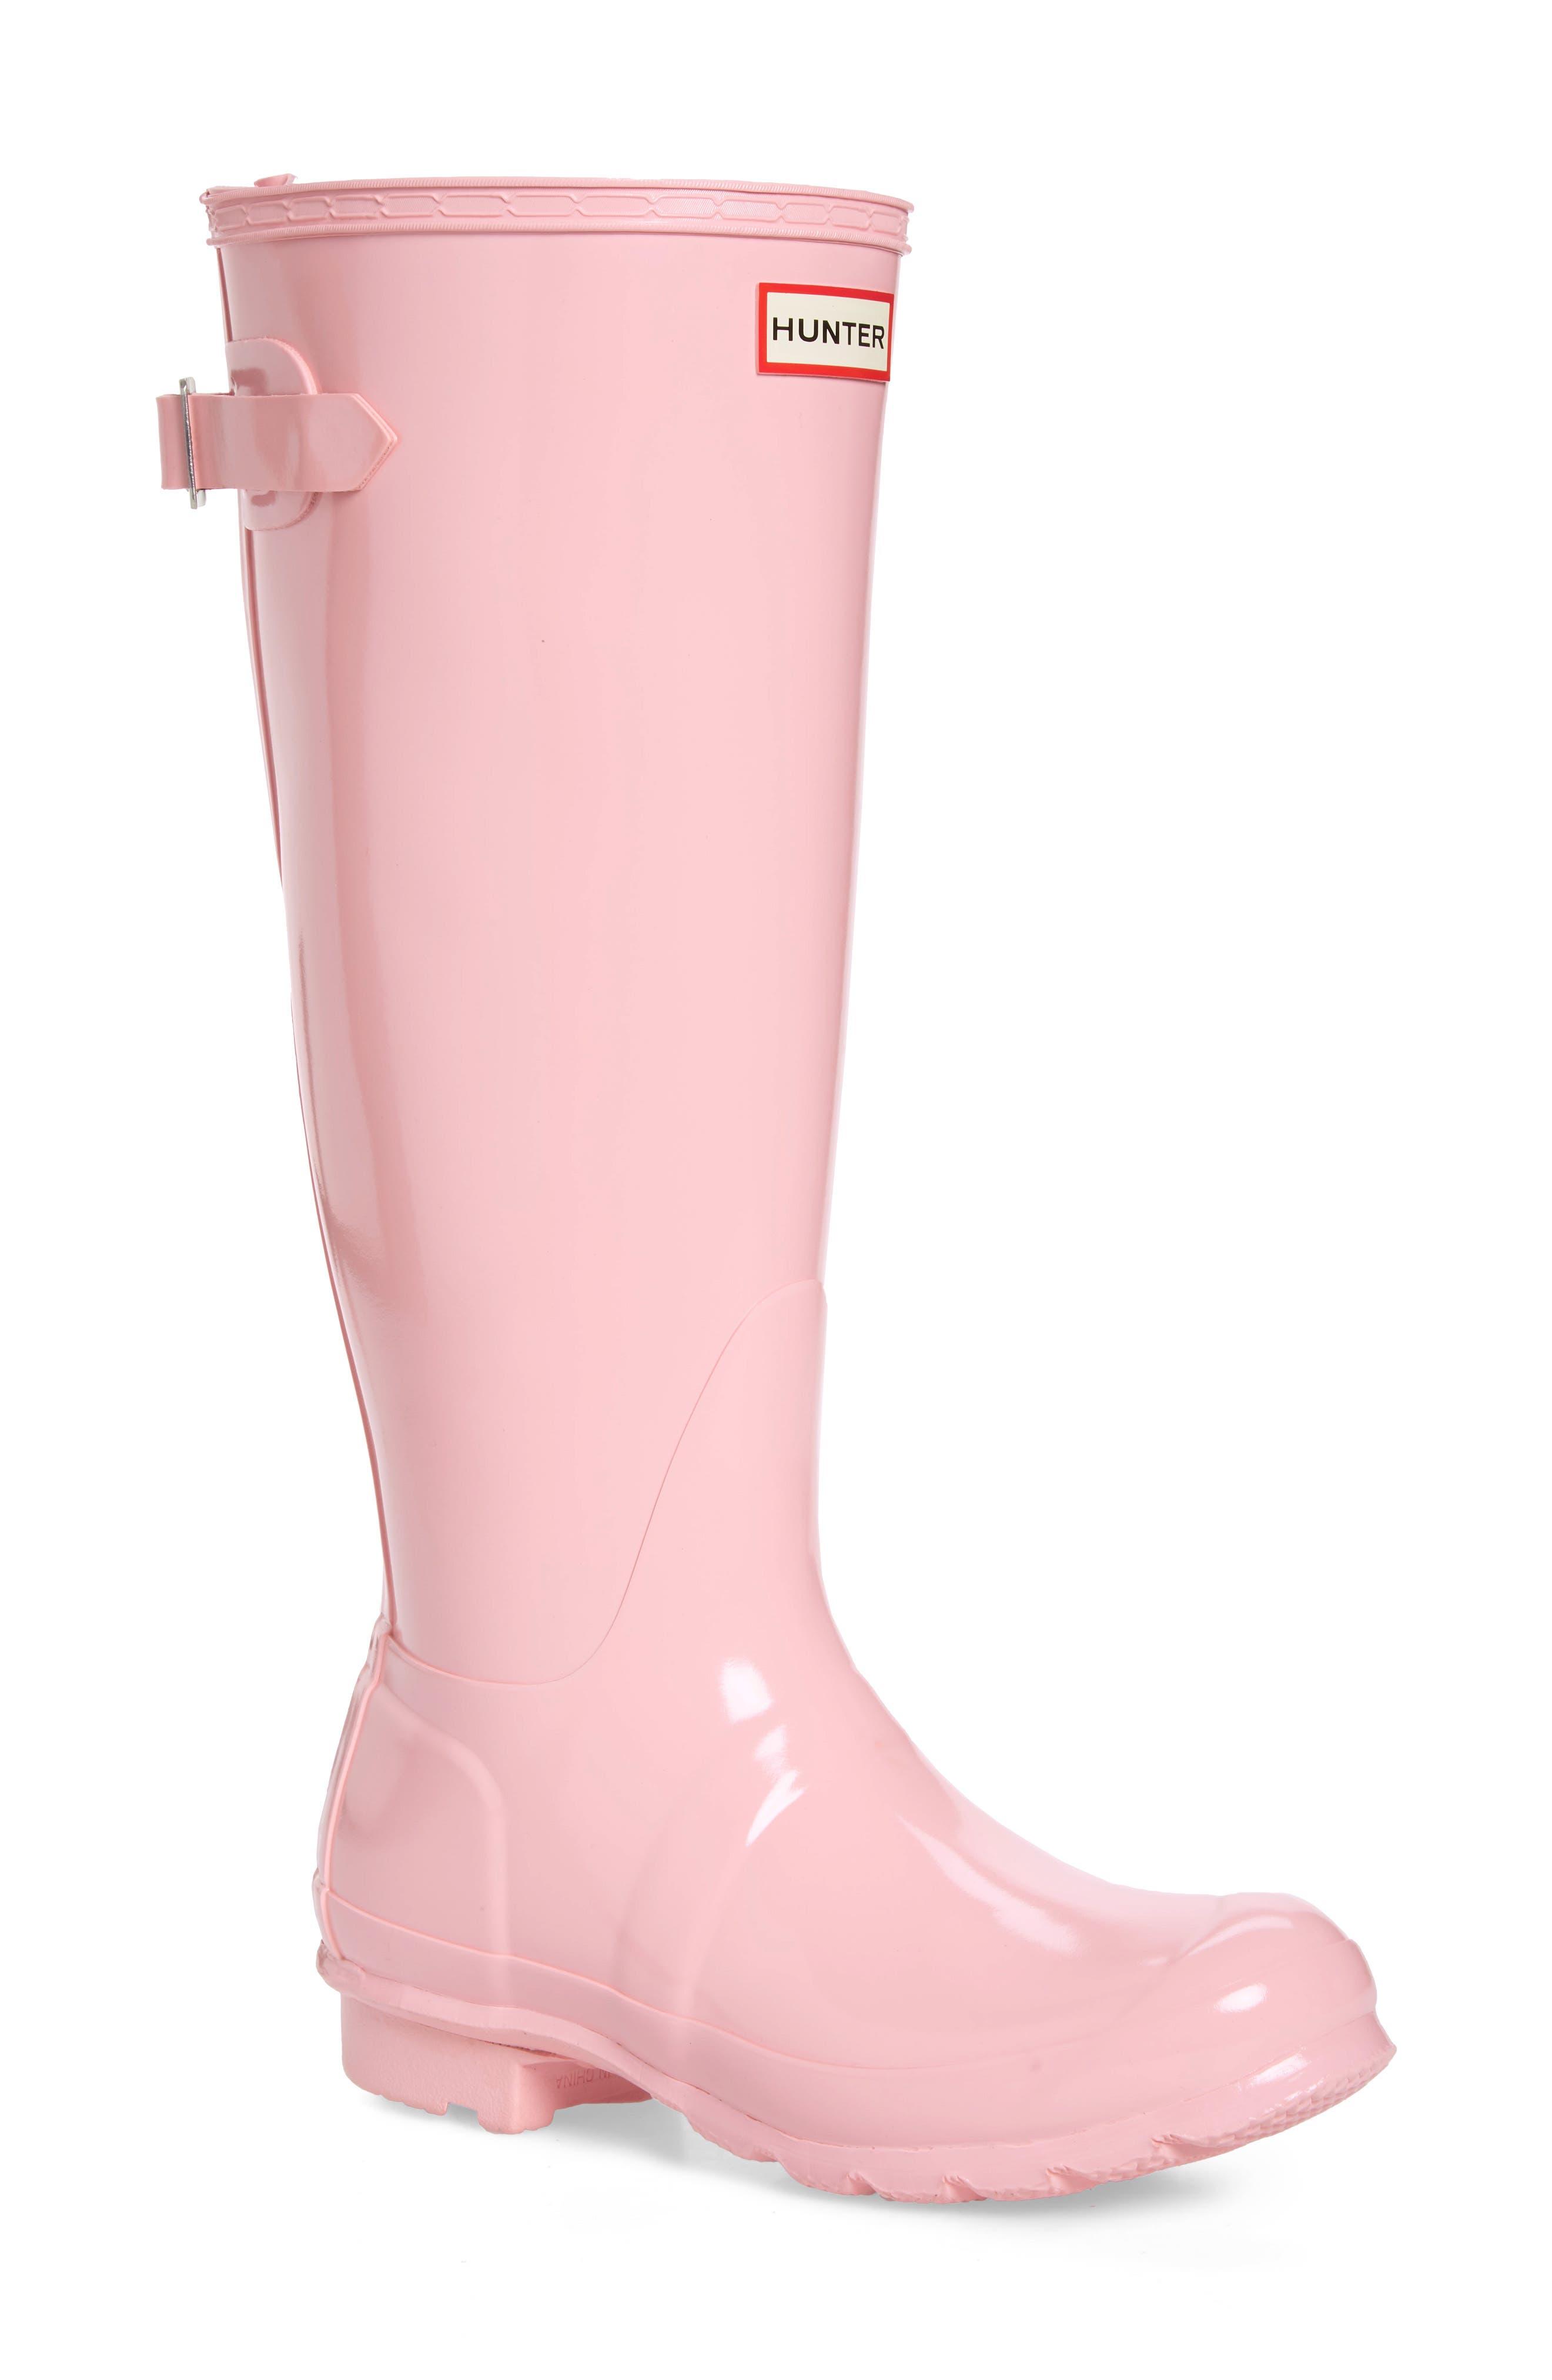 HUNTER, Adjustable Back Gloss Waterproof Rain Boot, Main thumbnail 1, color, CANDY FLOSS RUBBER